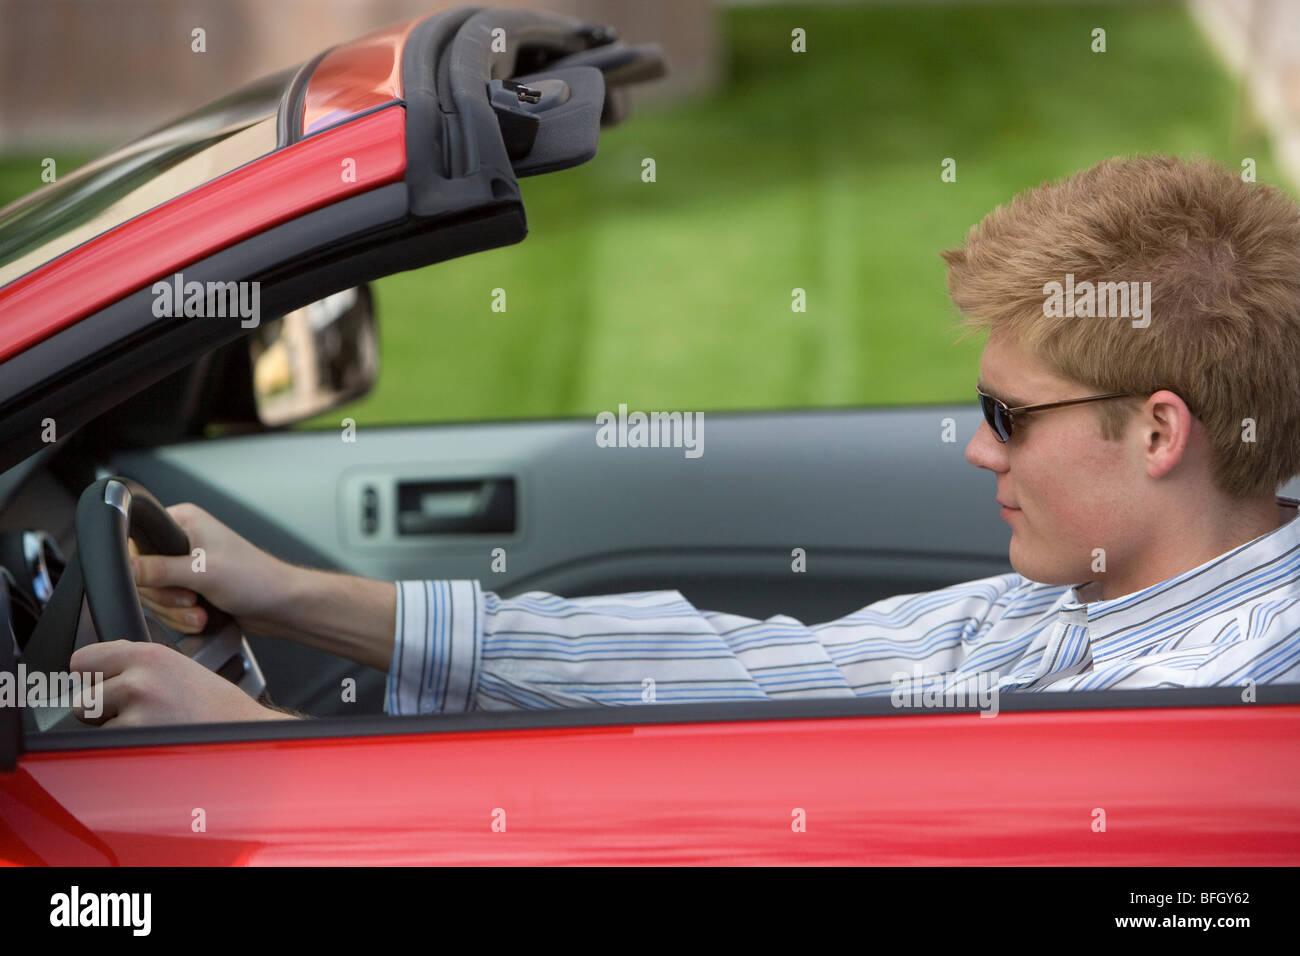 Man Driving Car - Stock Image